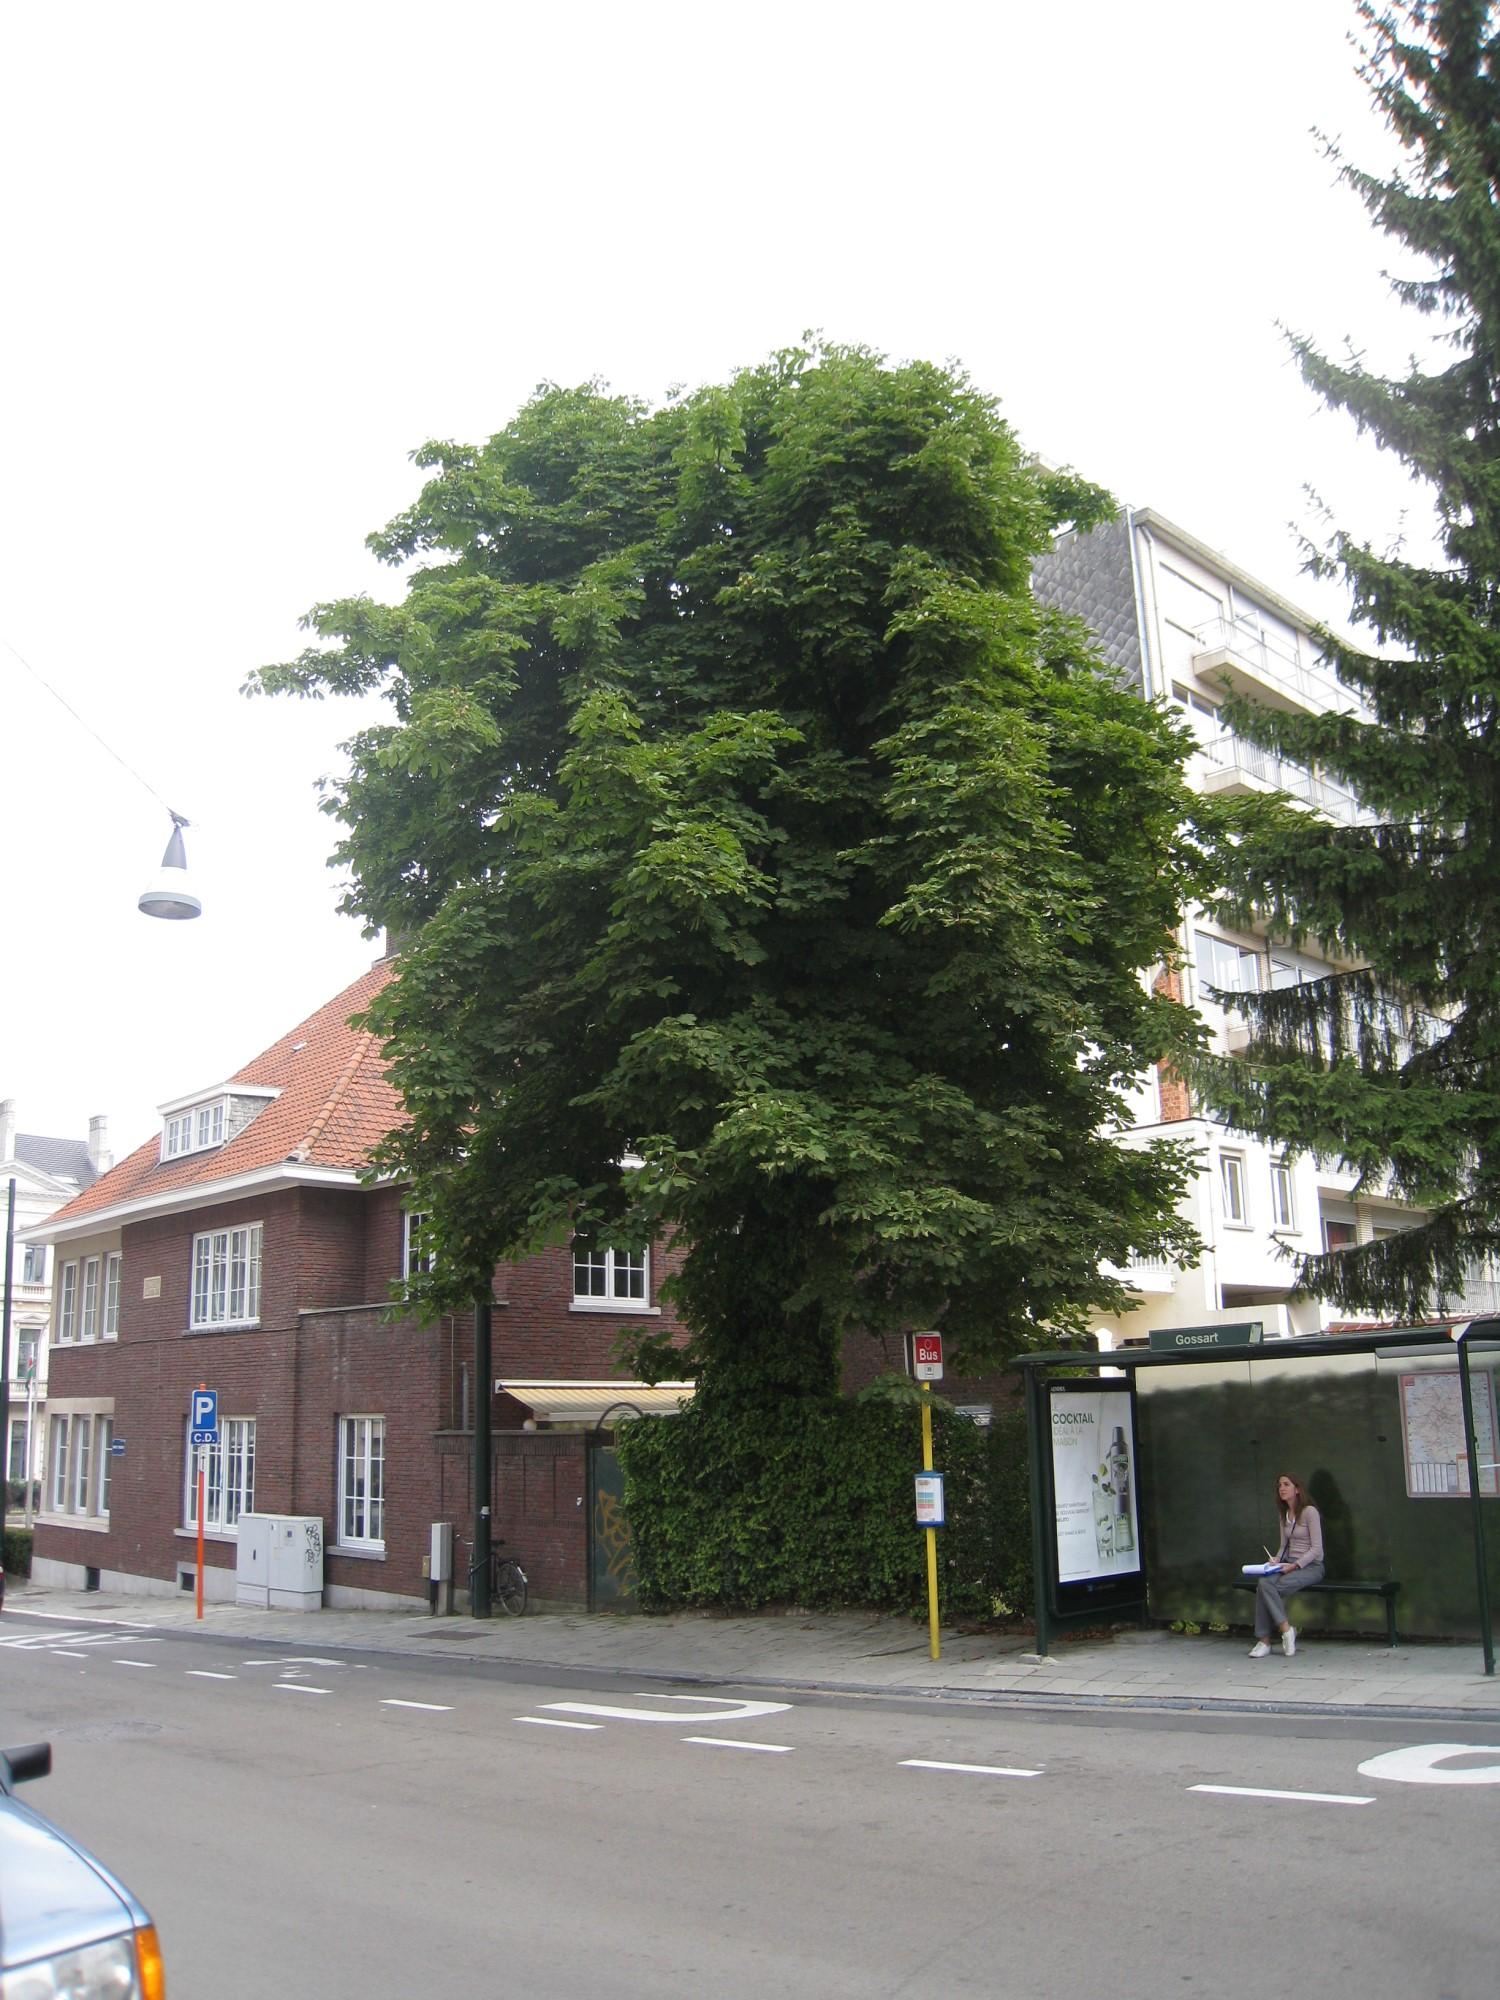 Marronnier commun – Uccle, Avenue Winston Churchill, 185 –  05 Août 2010